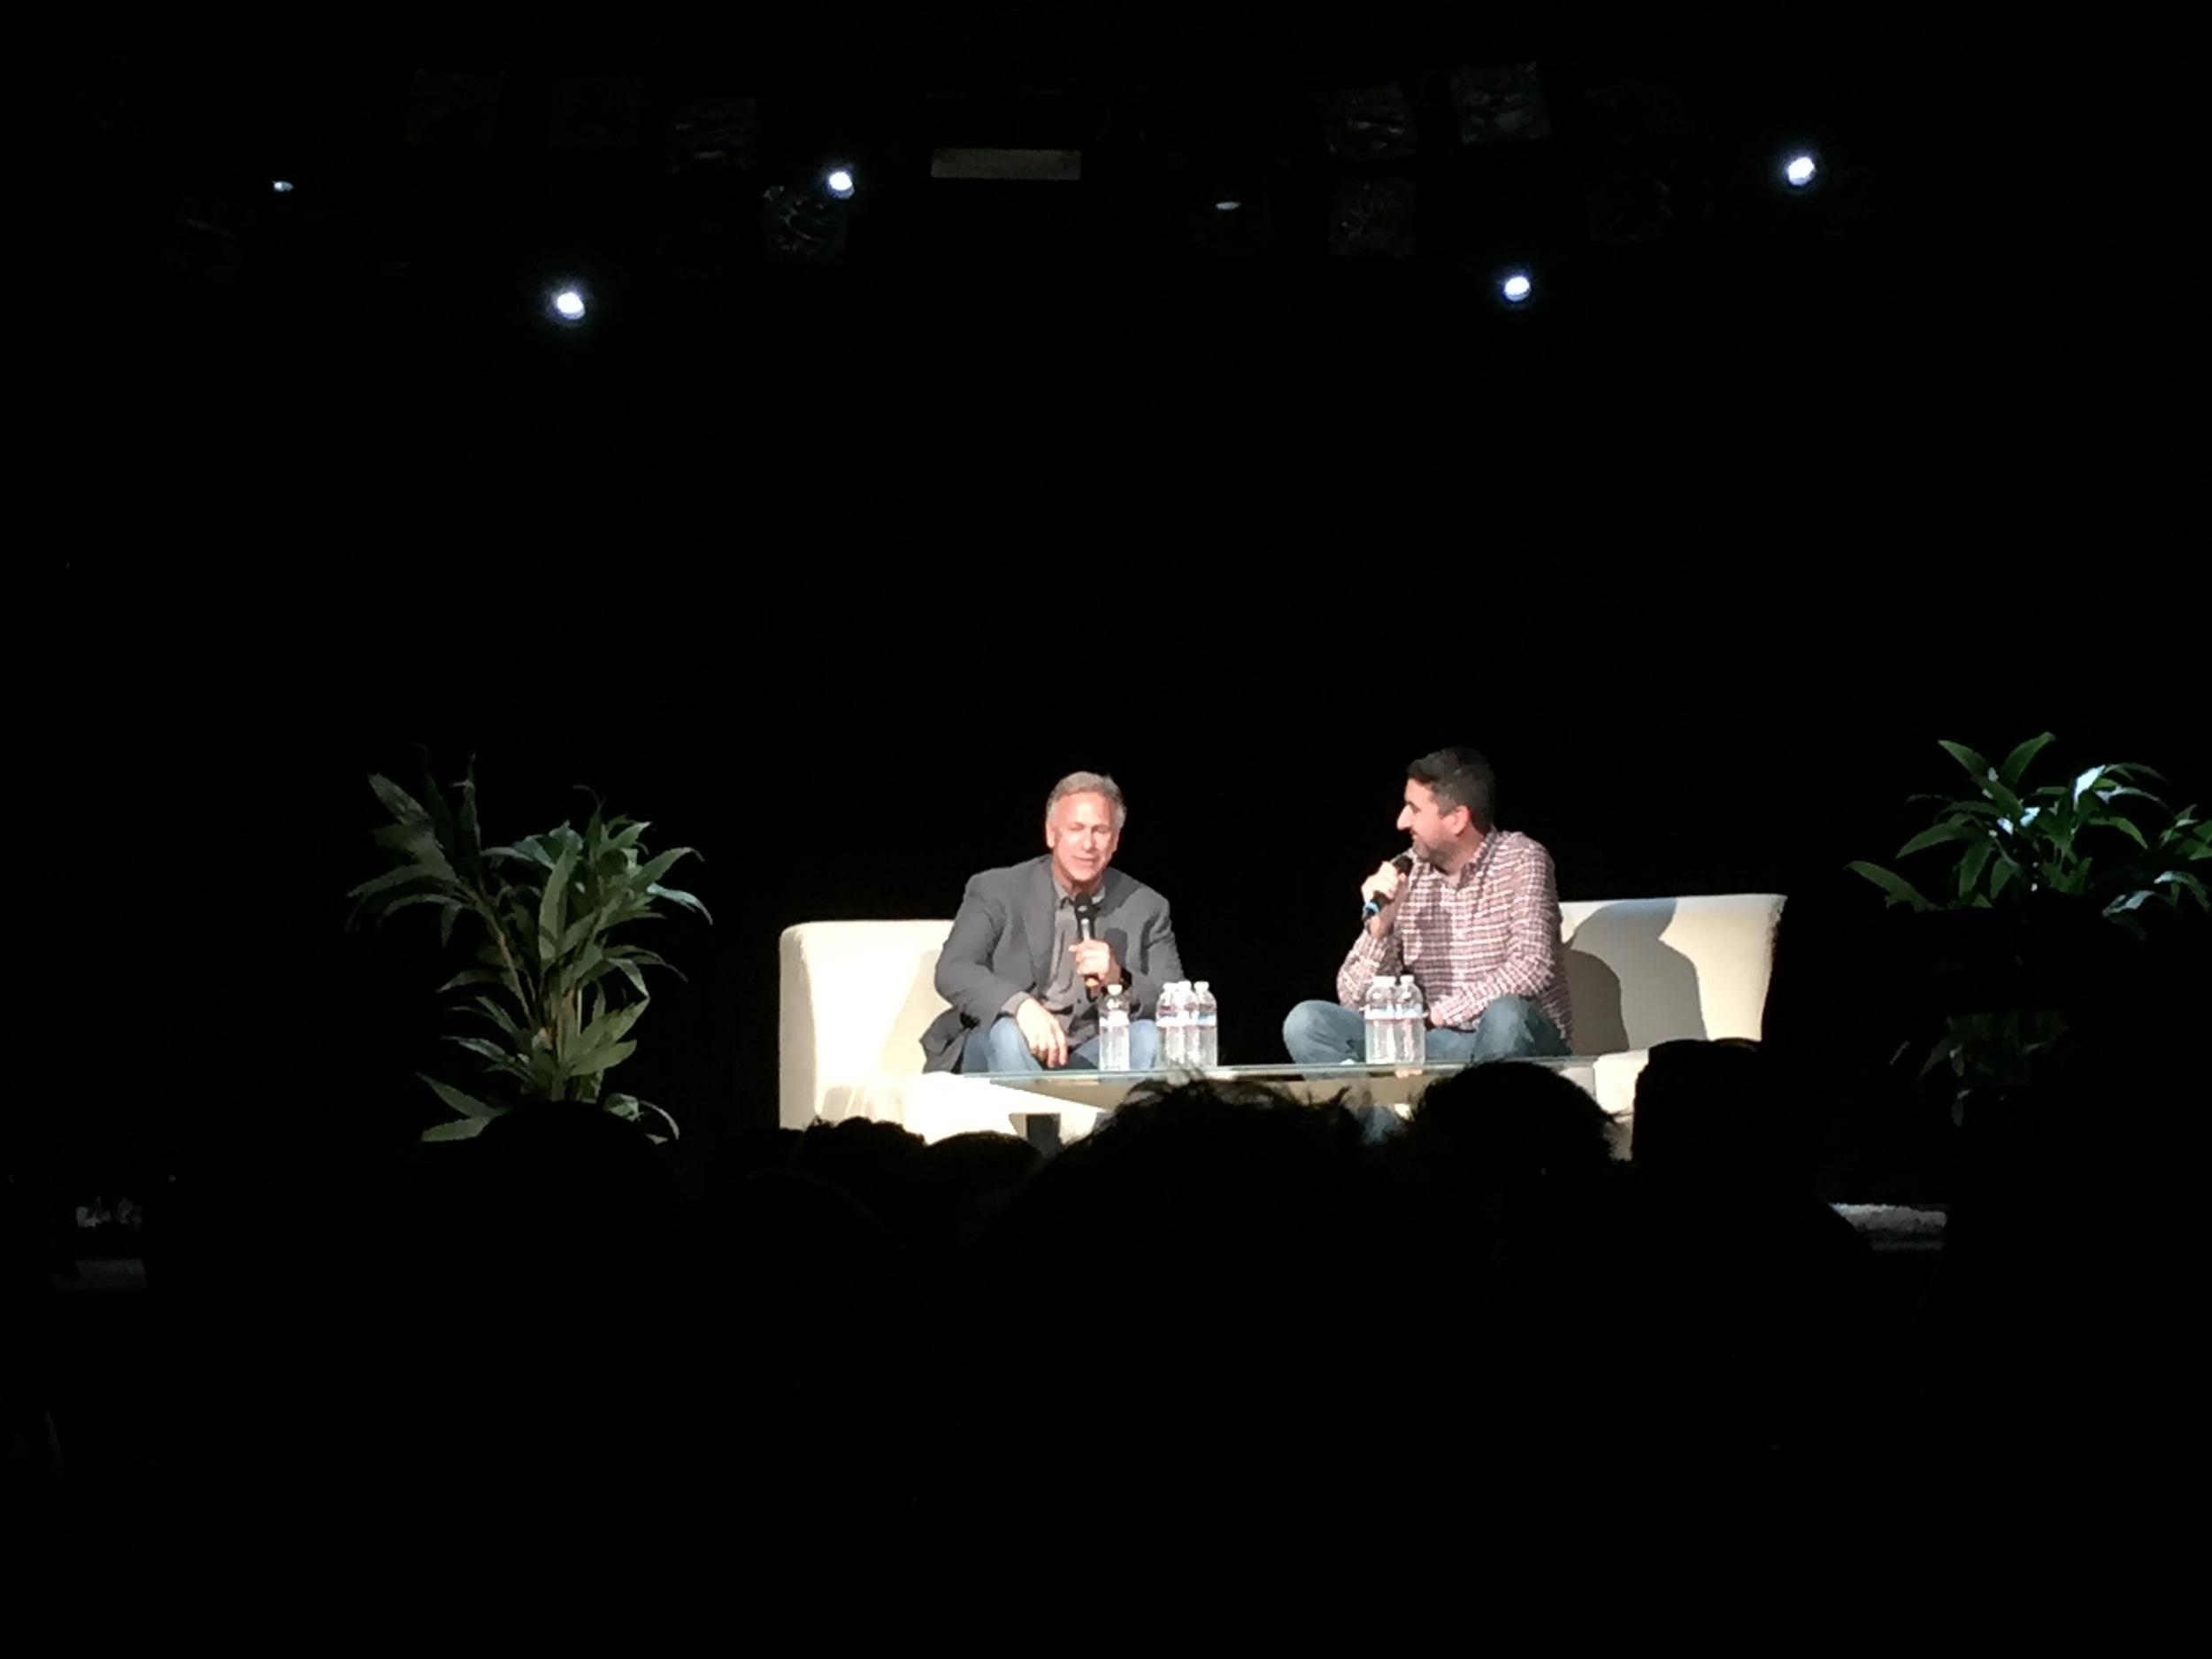 Phil Schiller with John Gruber